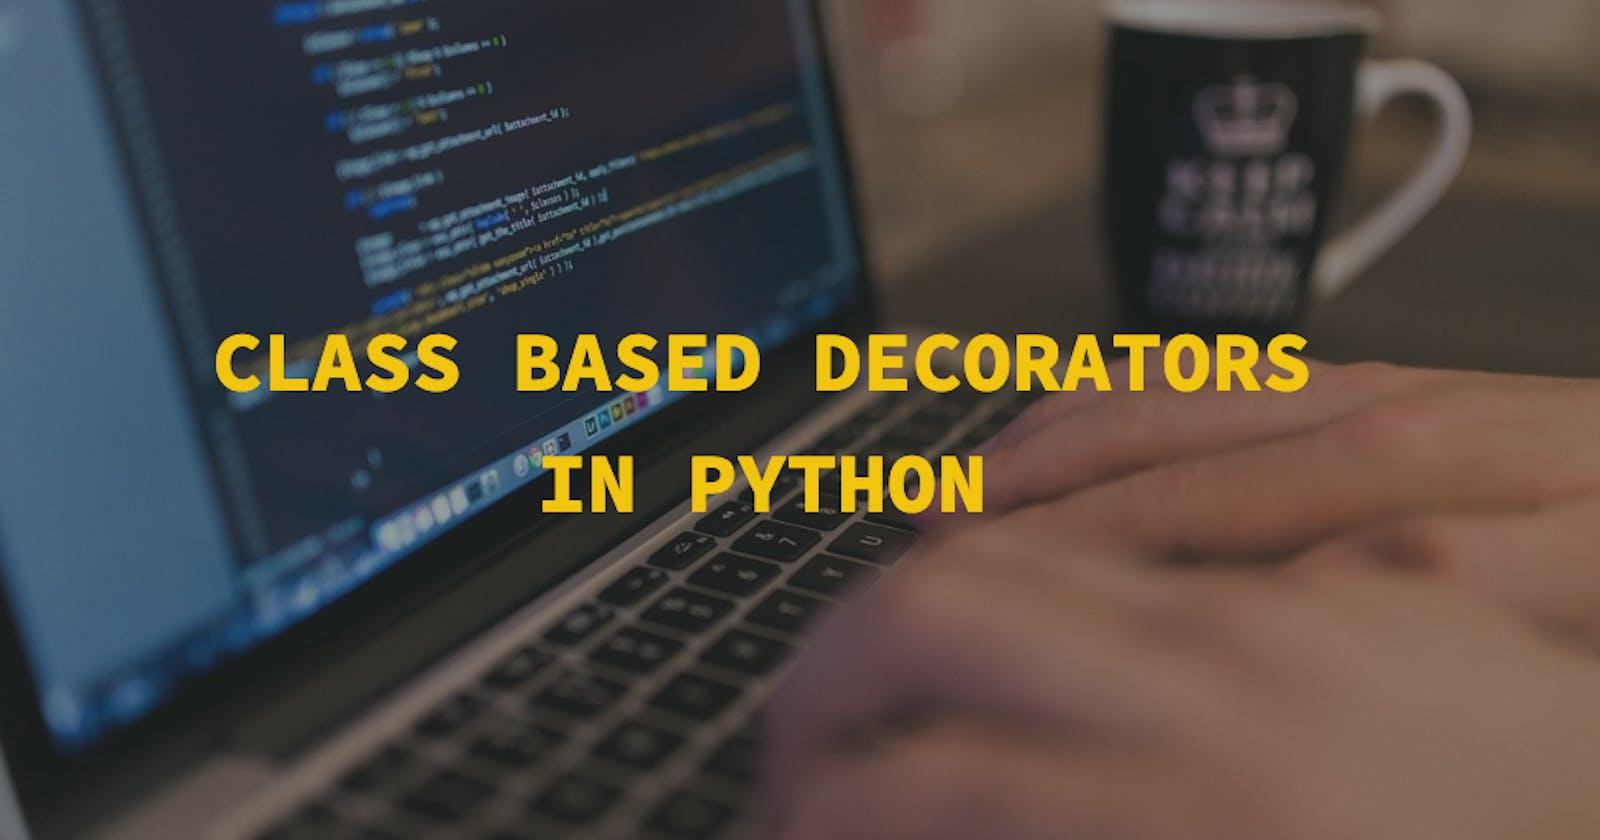 Class based decorators in python